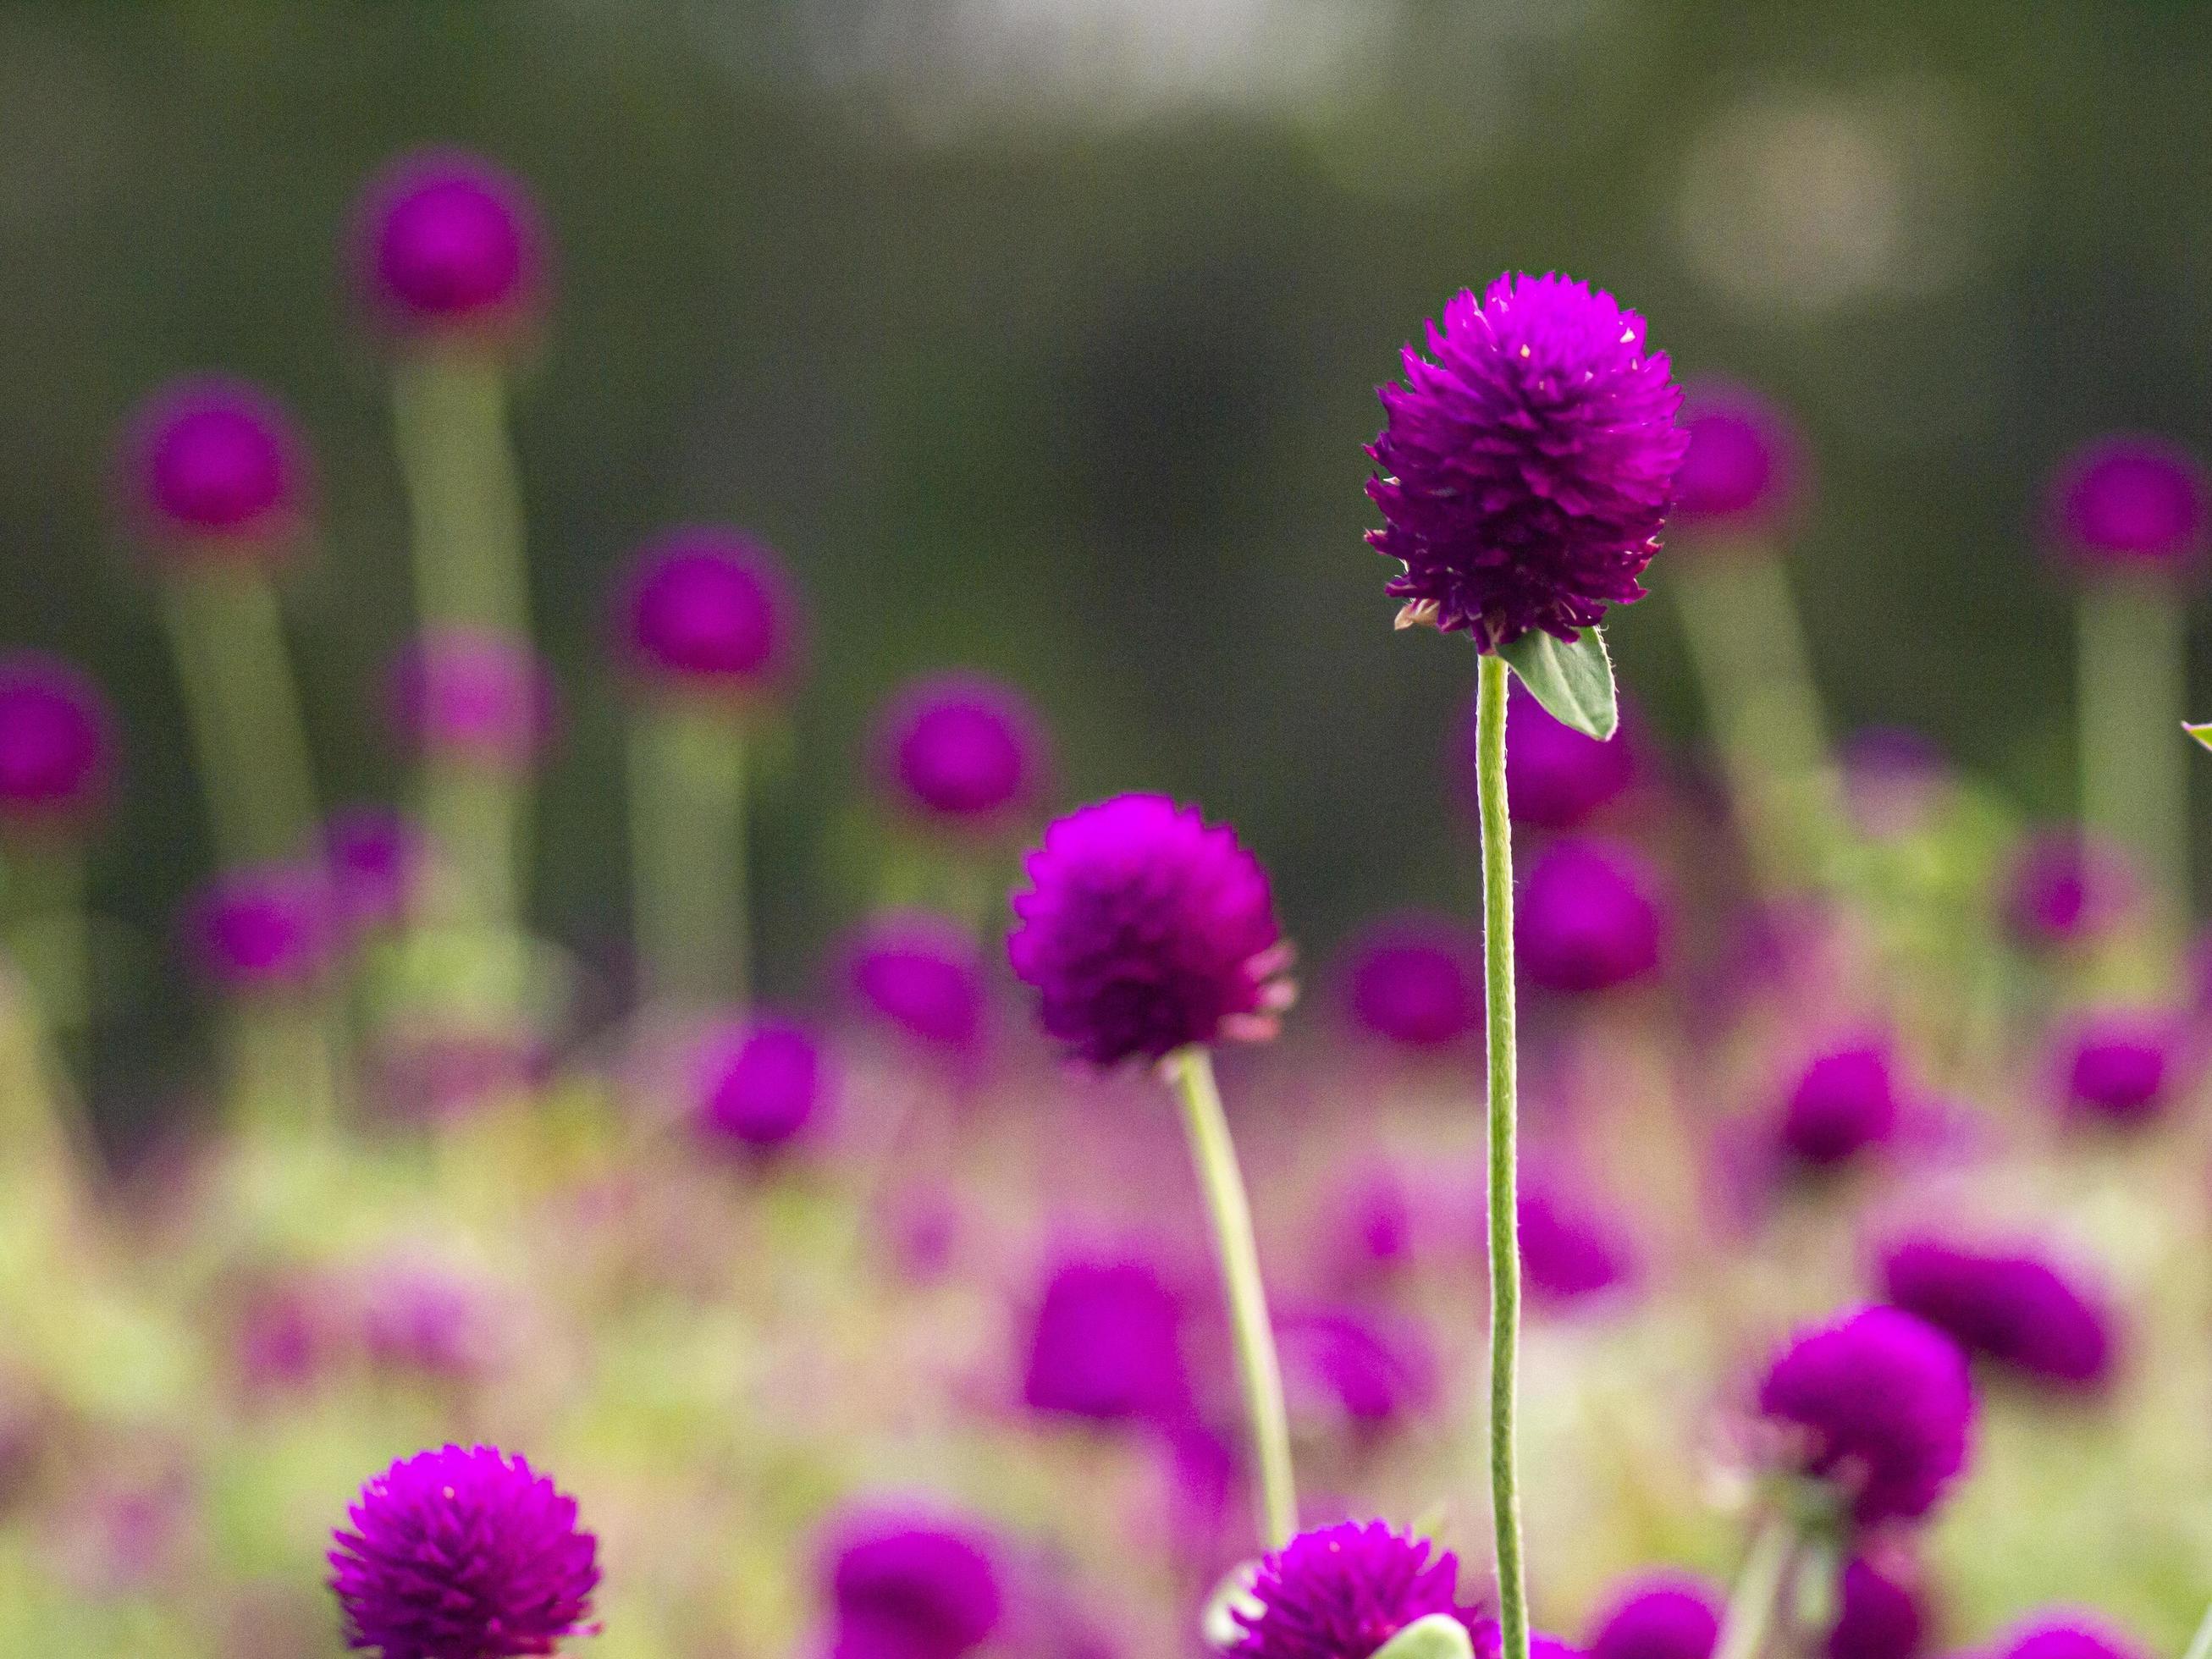 Vintage Background Little Flowers Nature Beautiful Toning Design Spring Nature Sun Plants Purple Flower Stock Photo